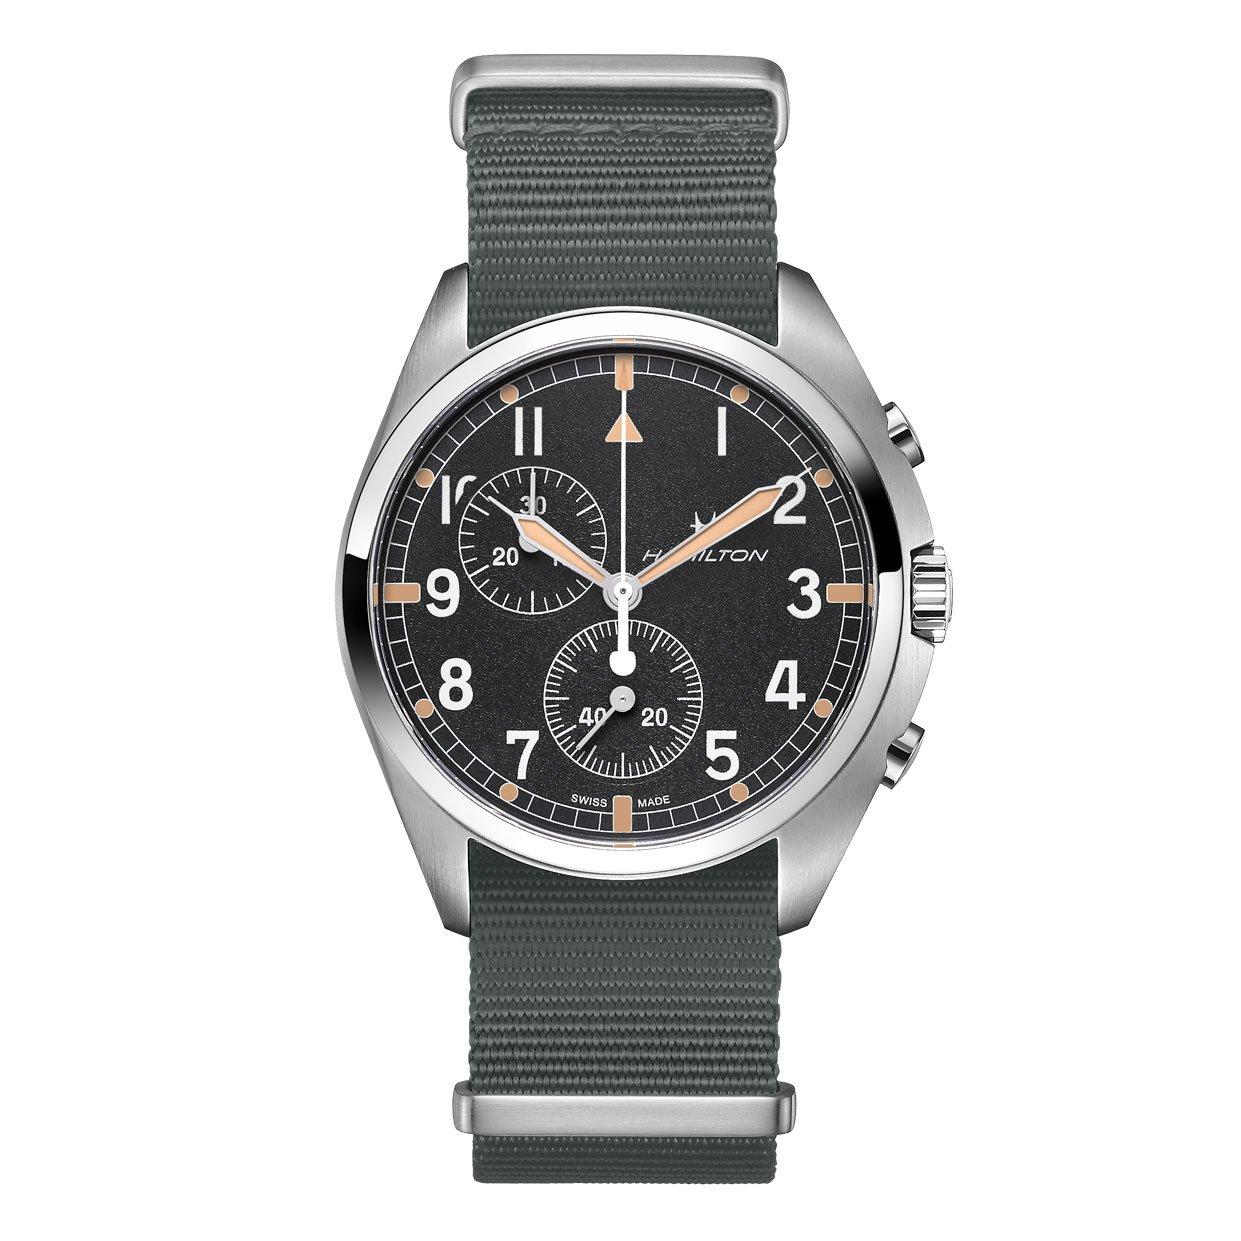 Hamilton Khaki Aviation Pilot Pioneer Chronograph Men's Watch